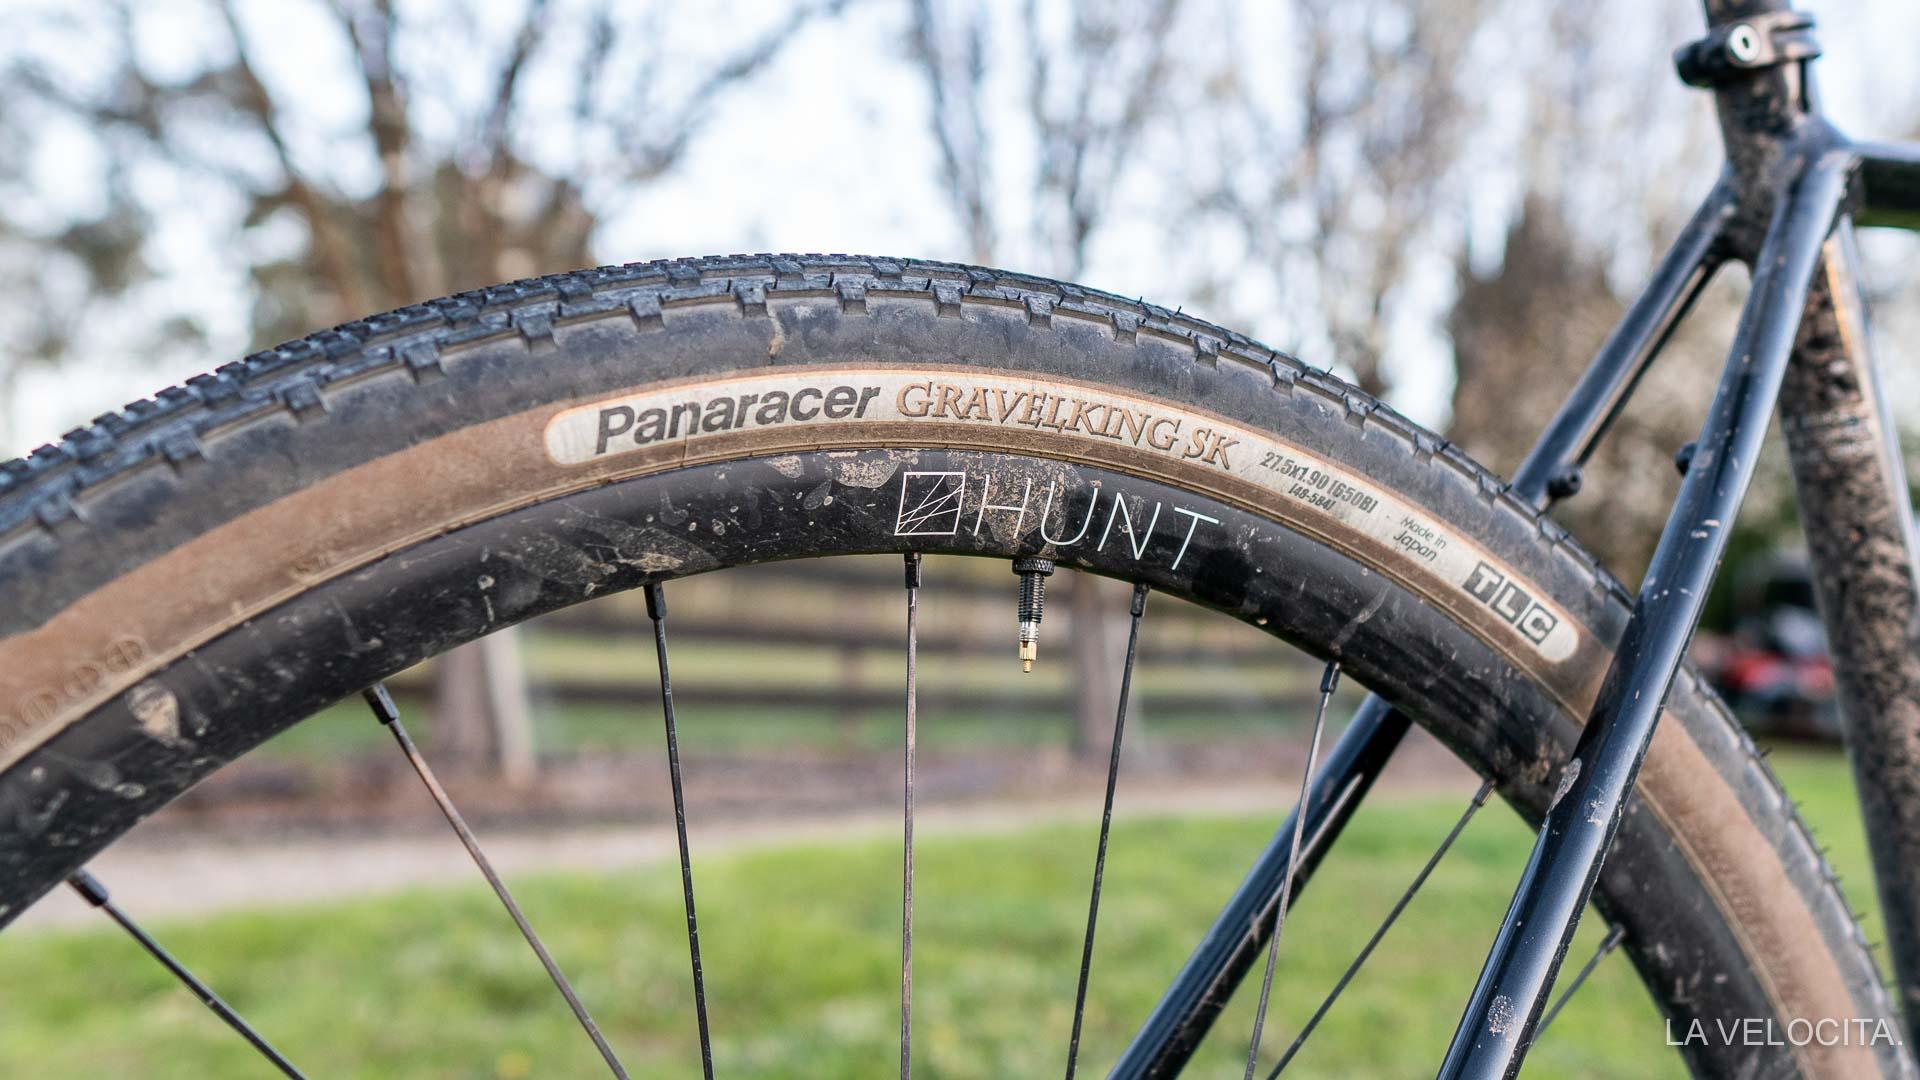 Panaracer GravelKing SK Tire 700x35mm Brown Sidewall